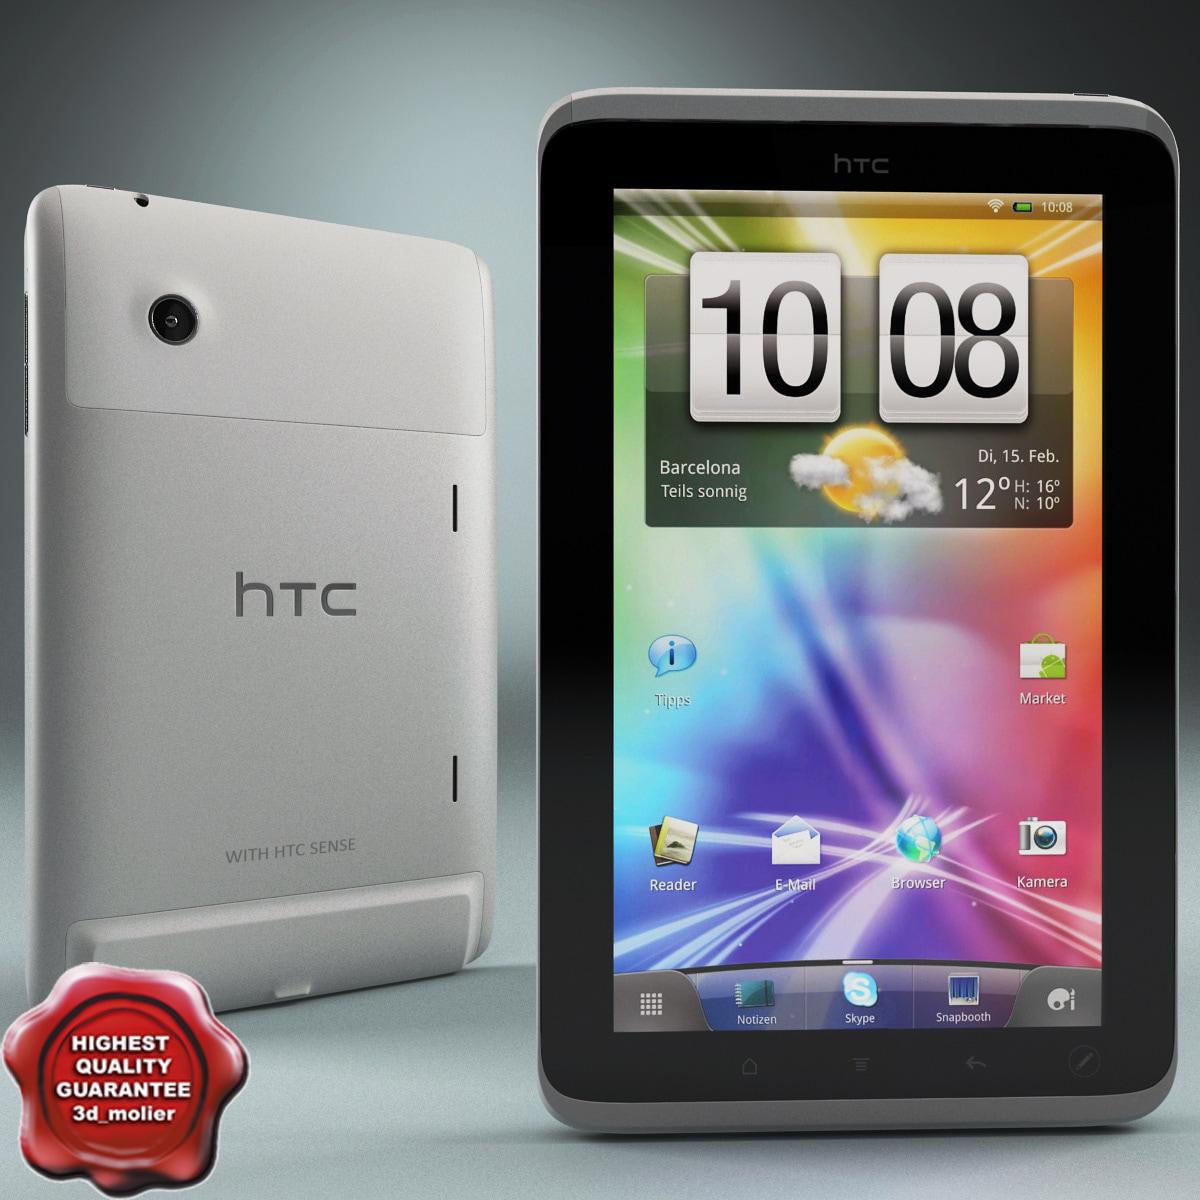 HTC_Flyer_Tablet_00.jpg